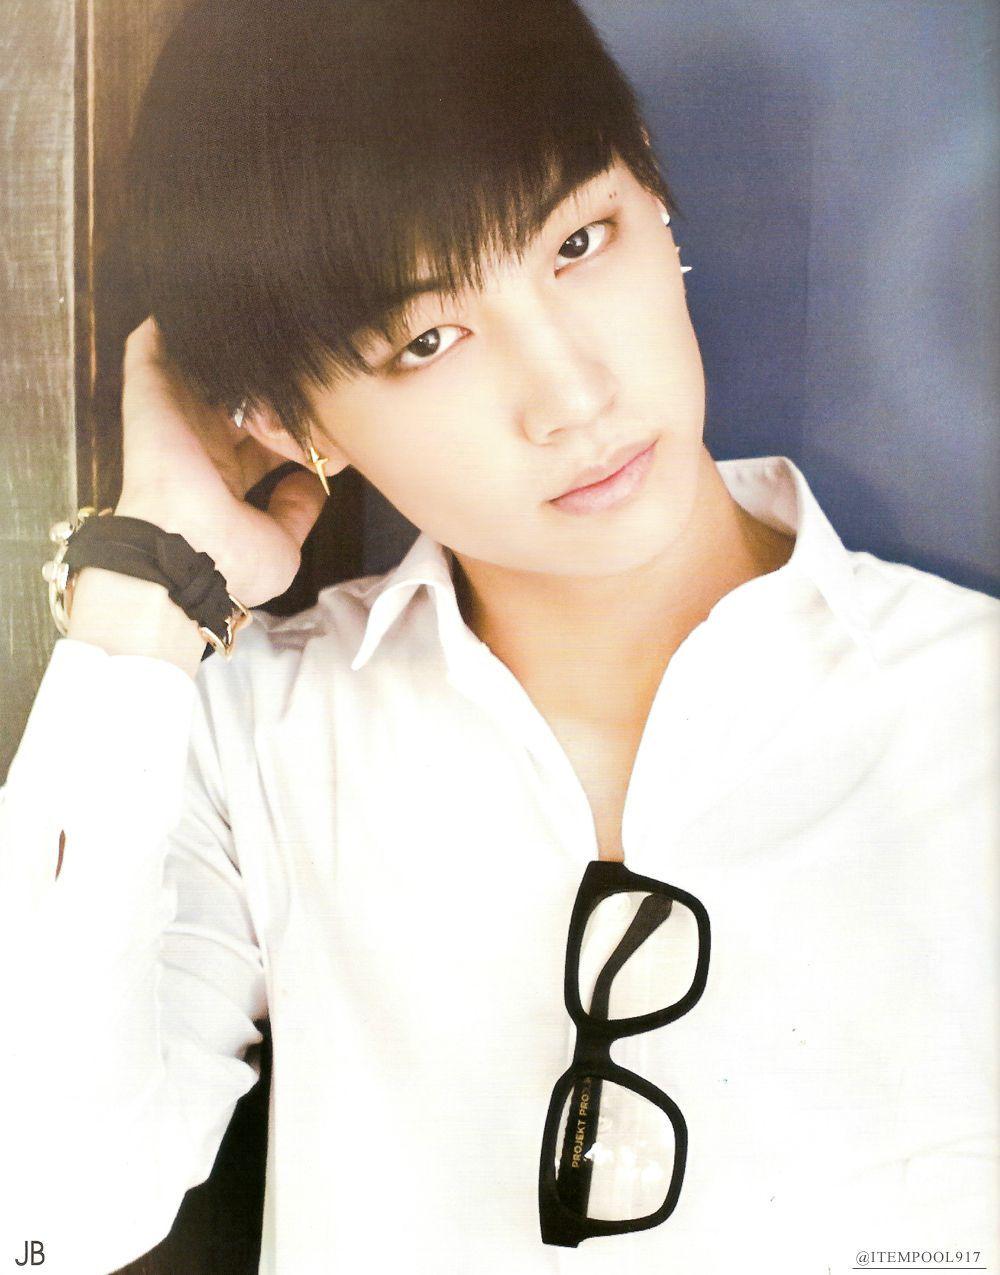 GOT7 10 Asia (Aug, 2014) #got7 #got710asia #jackson #mark #jb #jinyoung #kpopmap #flower #floverboy #hiphop #glass #sweg #kpopmap #jacksonpictorial #jackson #yukyum #bambam #dance